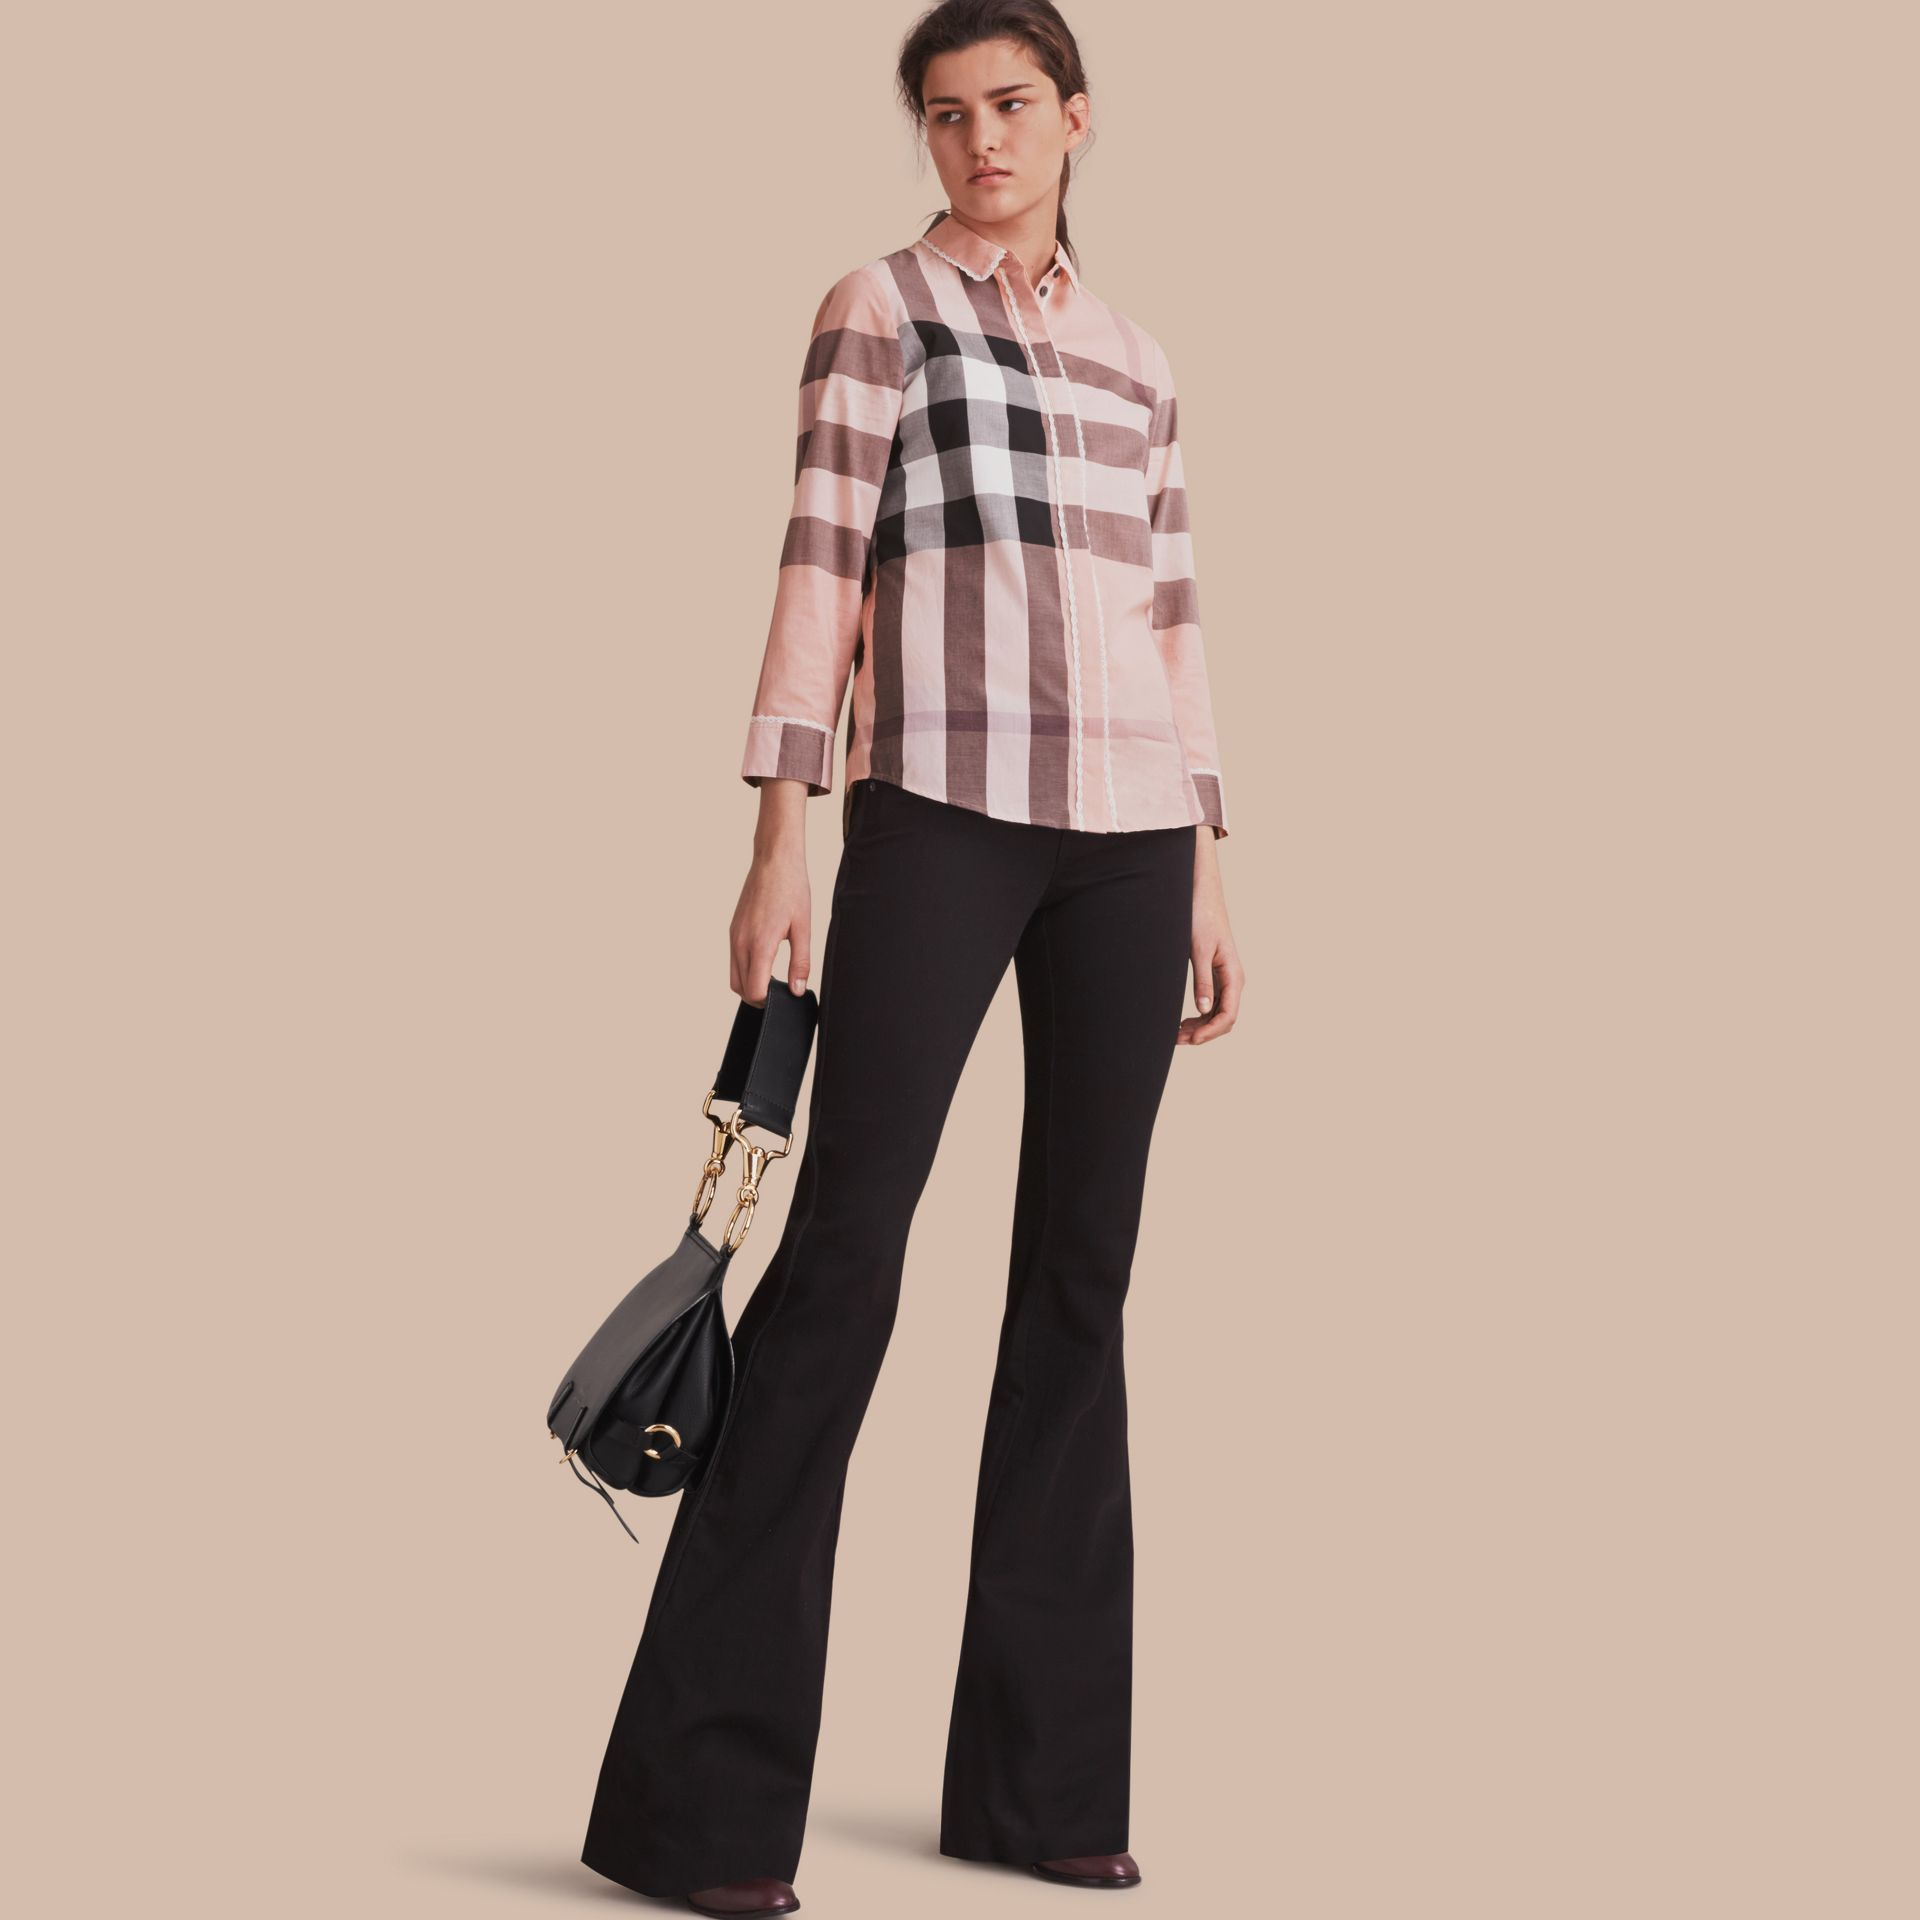 Lace Trim Check Cotton Shirt Antique Pink - gallery image 1